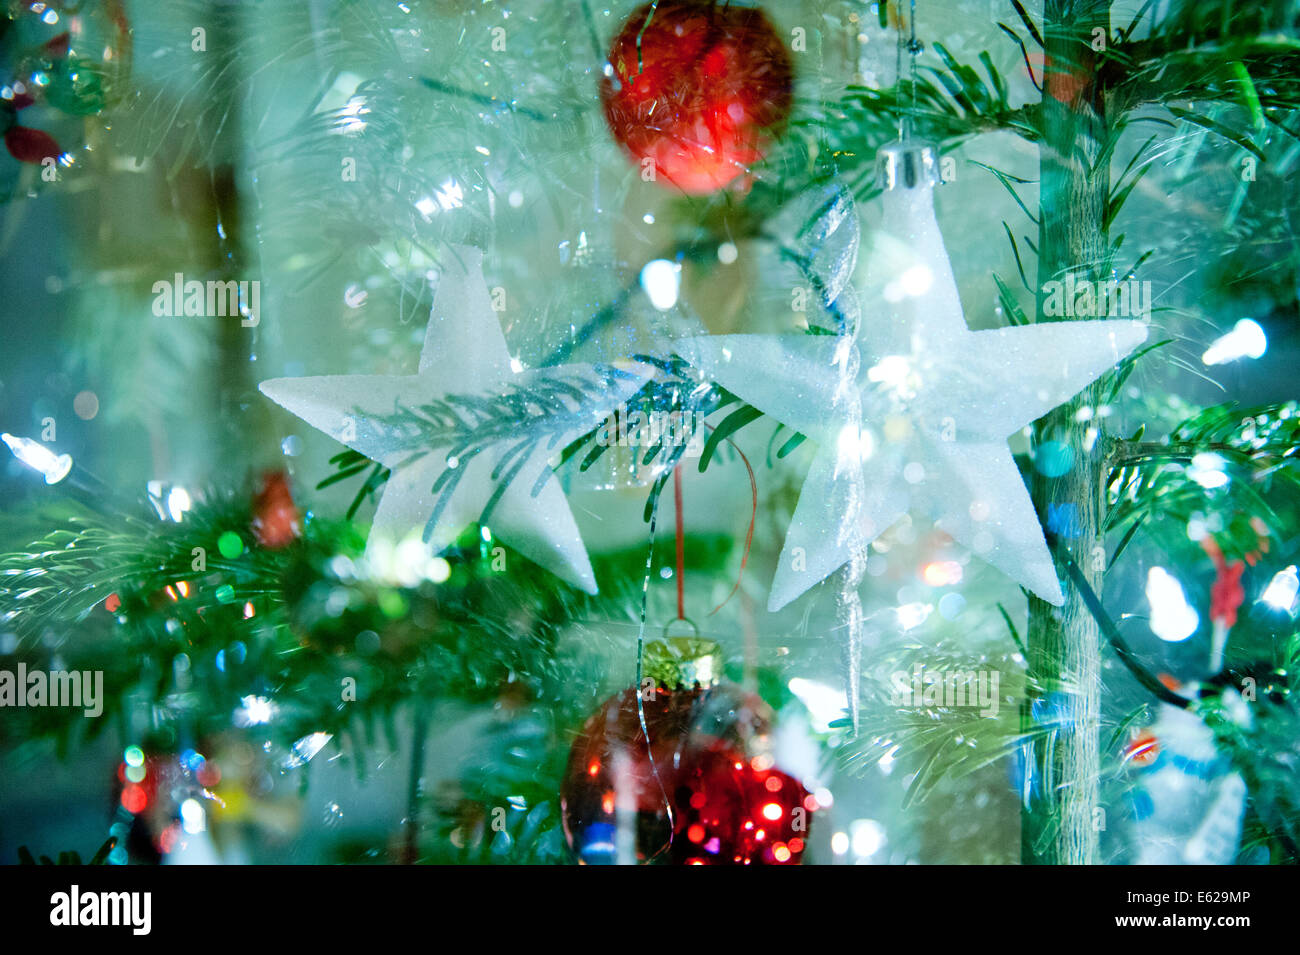 Twinkly vivace, Christmassy strati con aghi di pino, baubles, stelle e luci. Immagini Stock